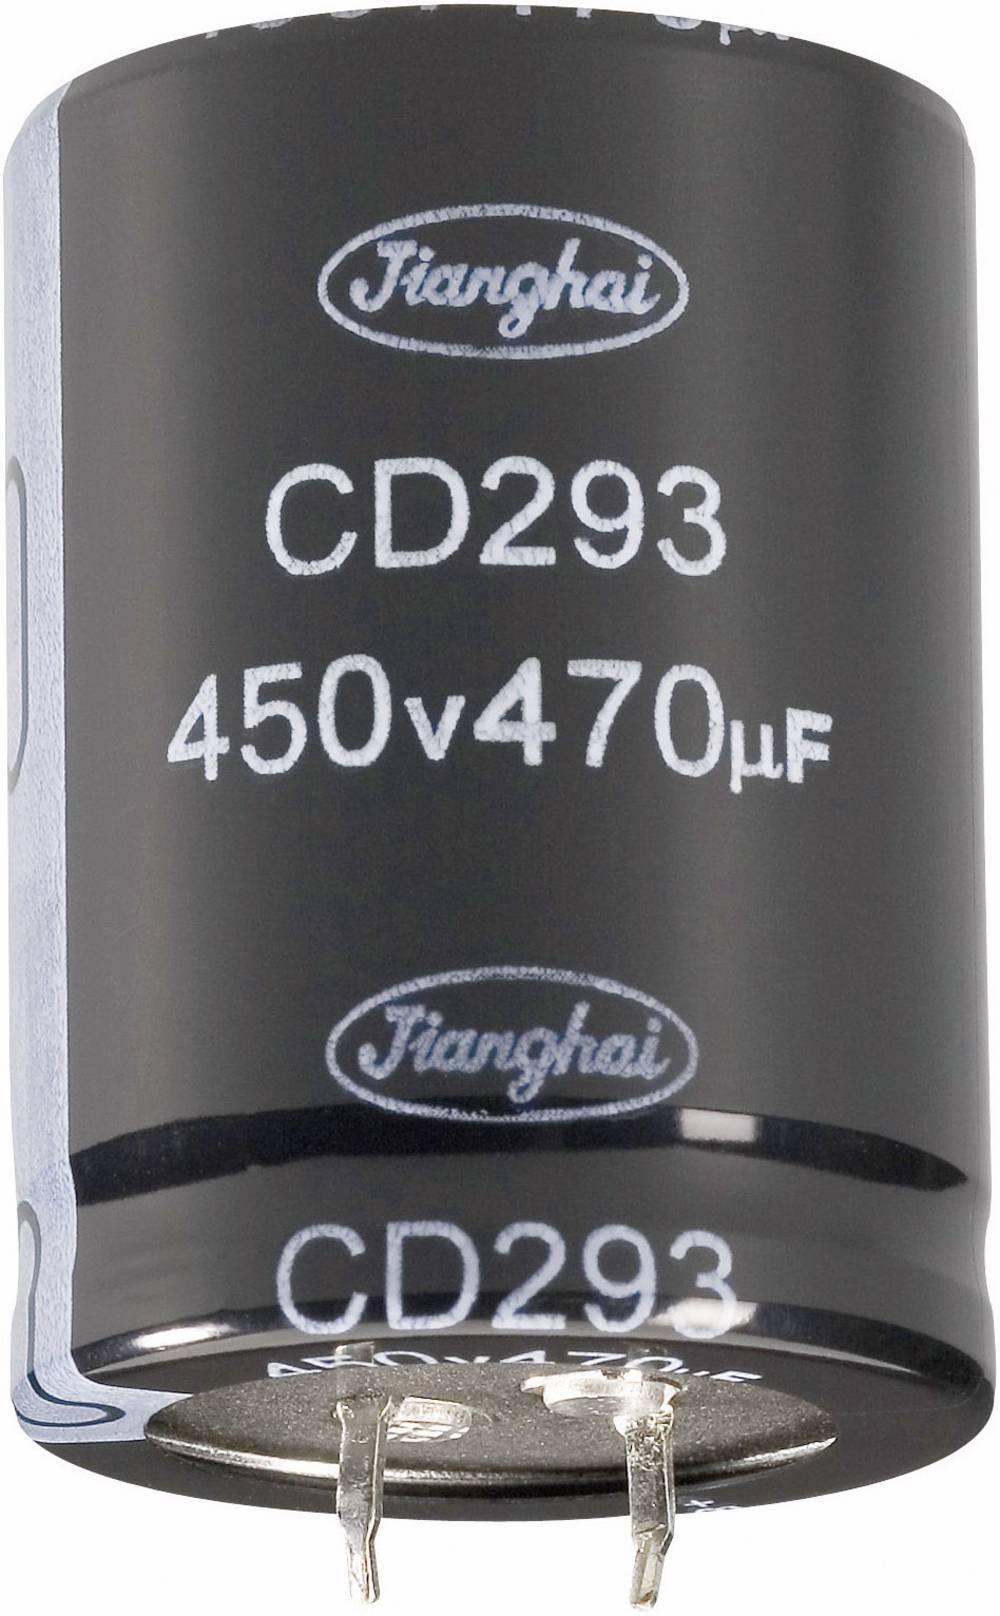 Jianghai Long-Life Zaskočni kondenzator (OxV) 30mm x 40mm 47000F 10 V ECS1ABZ473MT6P23040